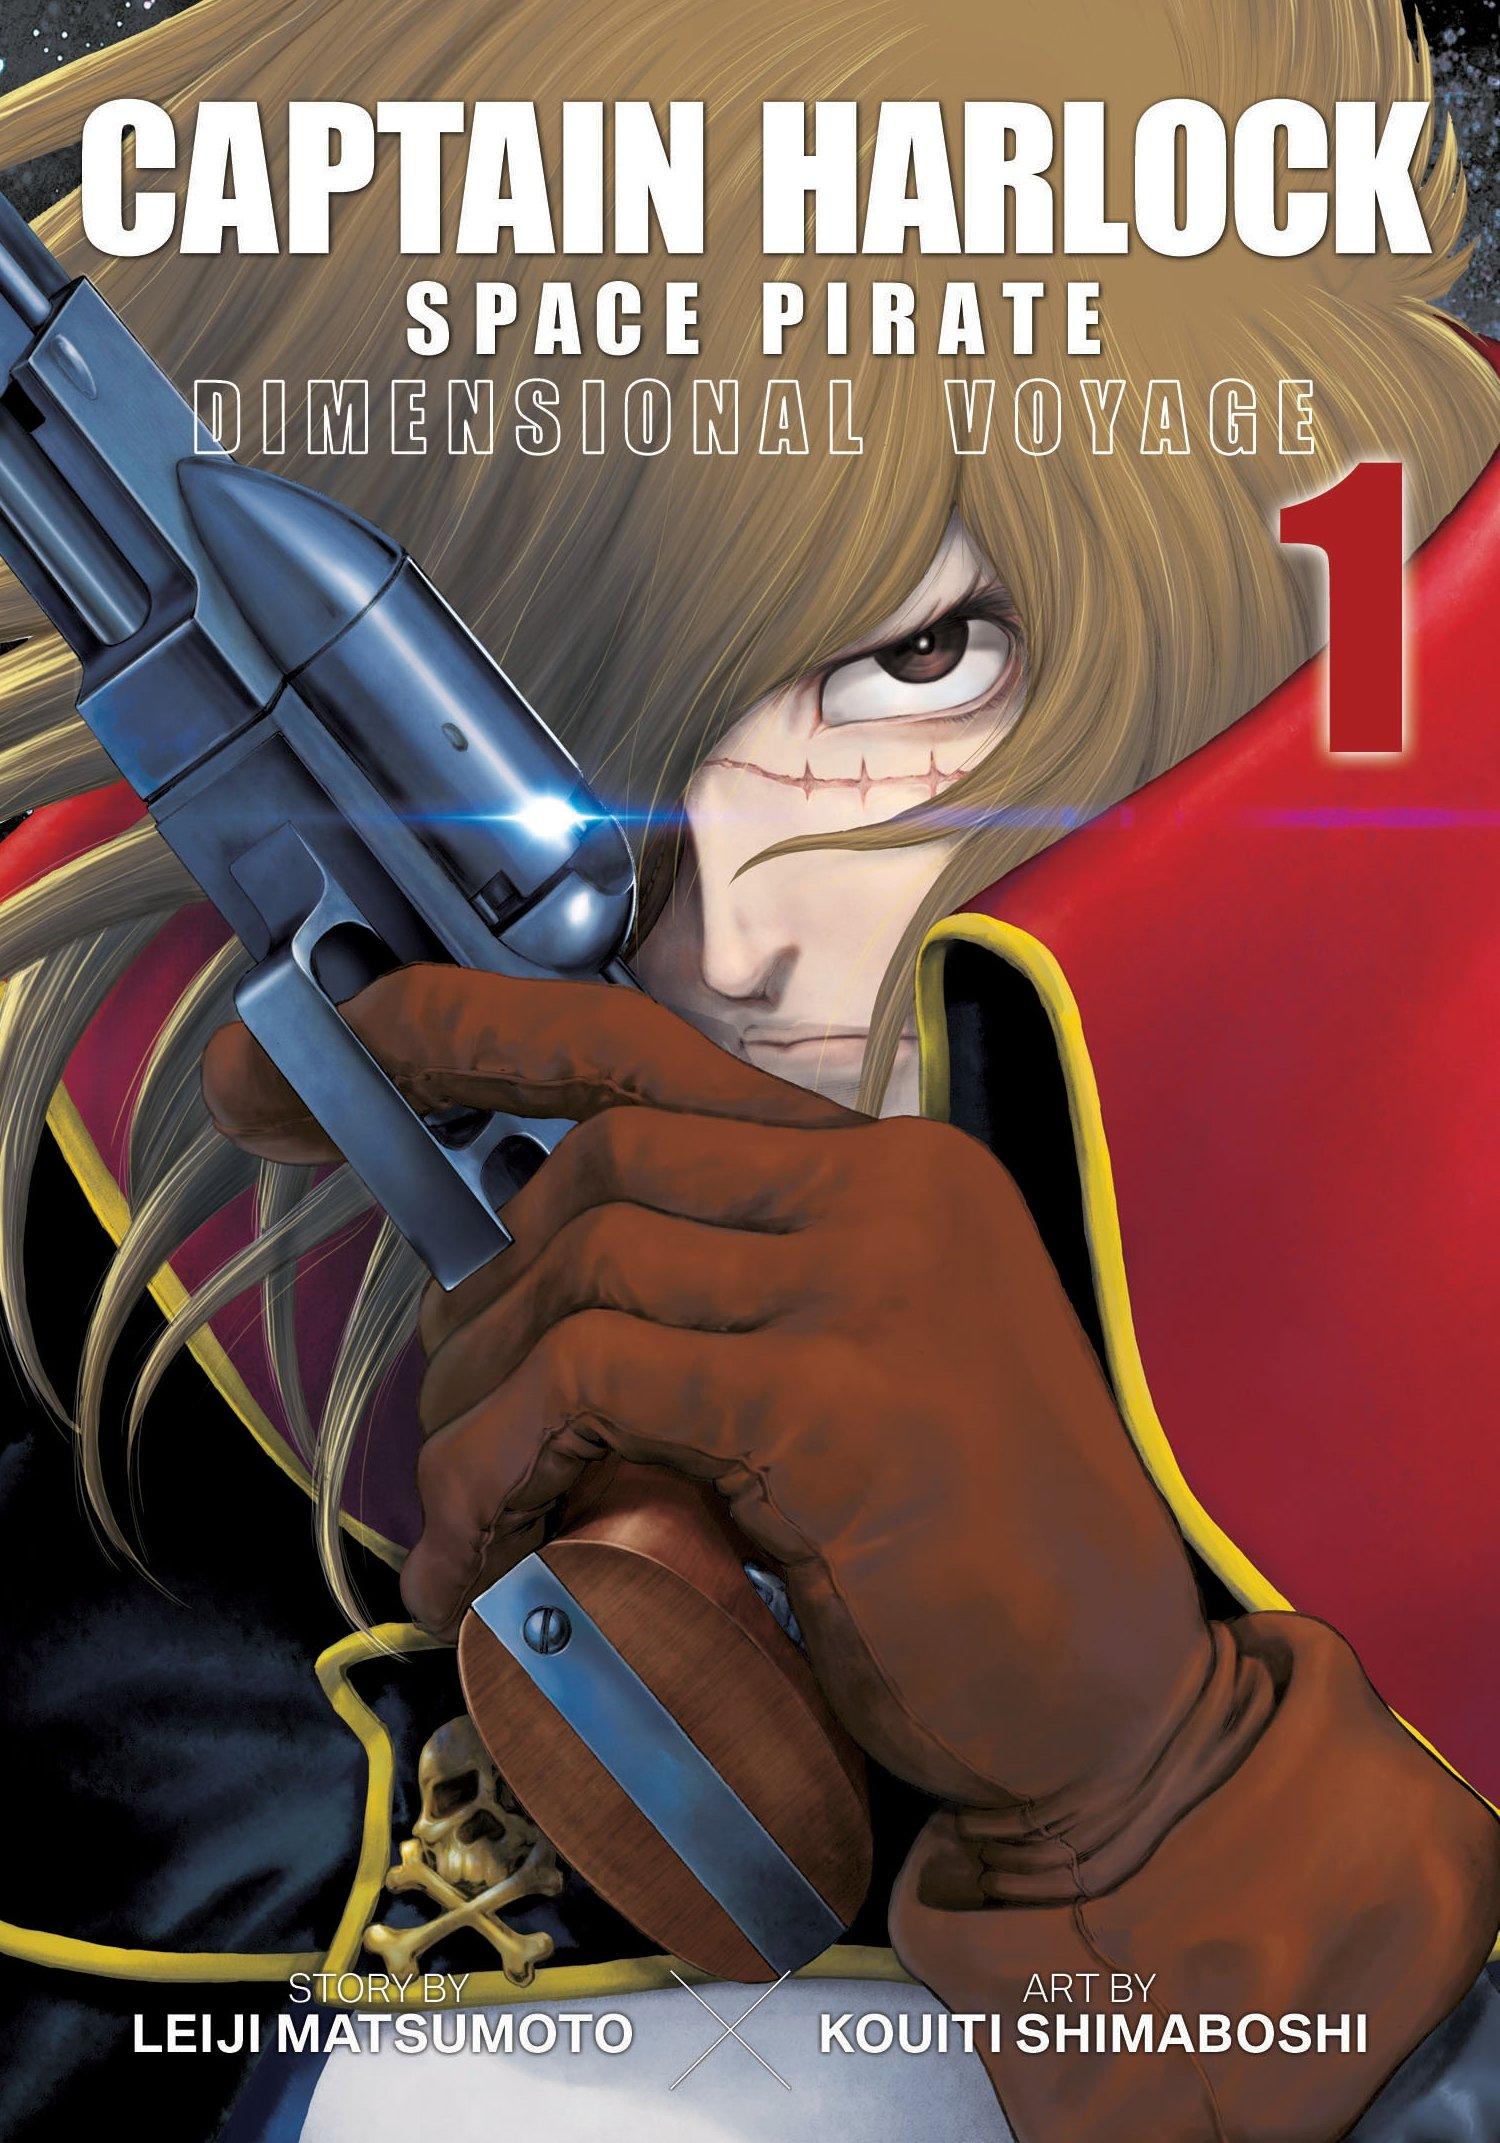 Read Online Captain Harlock: Dimensional Voyage Vol. 1 (Captain Harlock Space Pirate: Dimensional Voyage) pdf